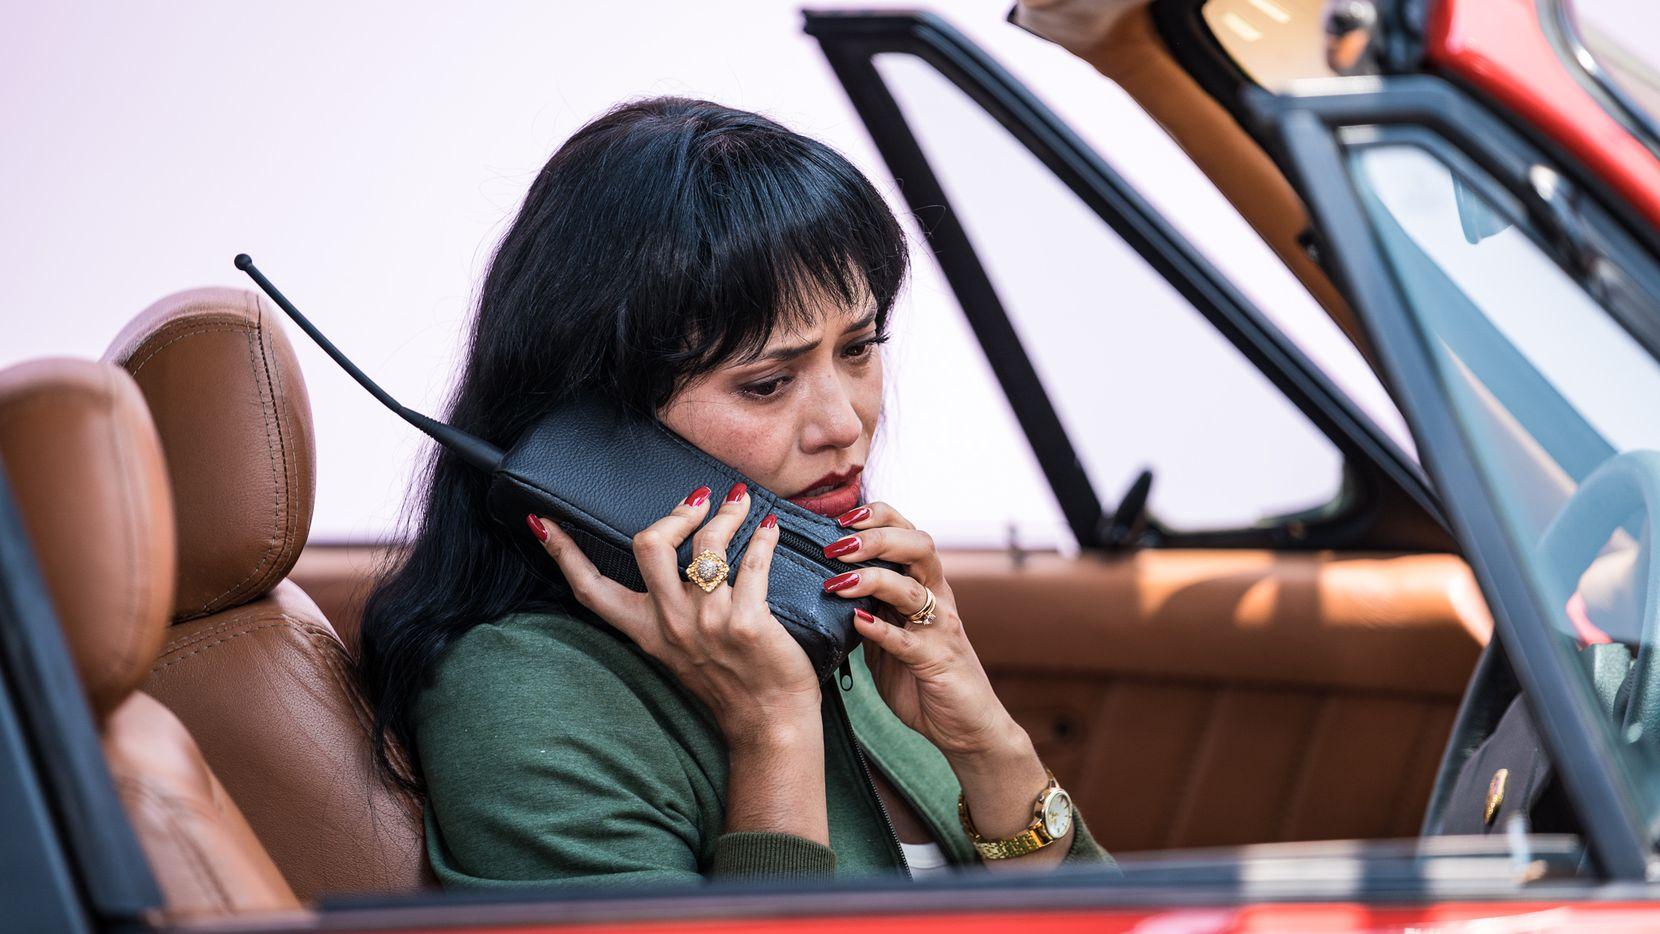 Maya Zapata interpreta a la Reina de la Música Tejana, Selena, en serie de Telemundo escrita por María Celeste Arrarás.